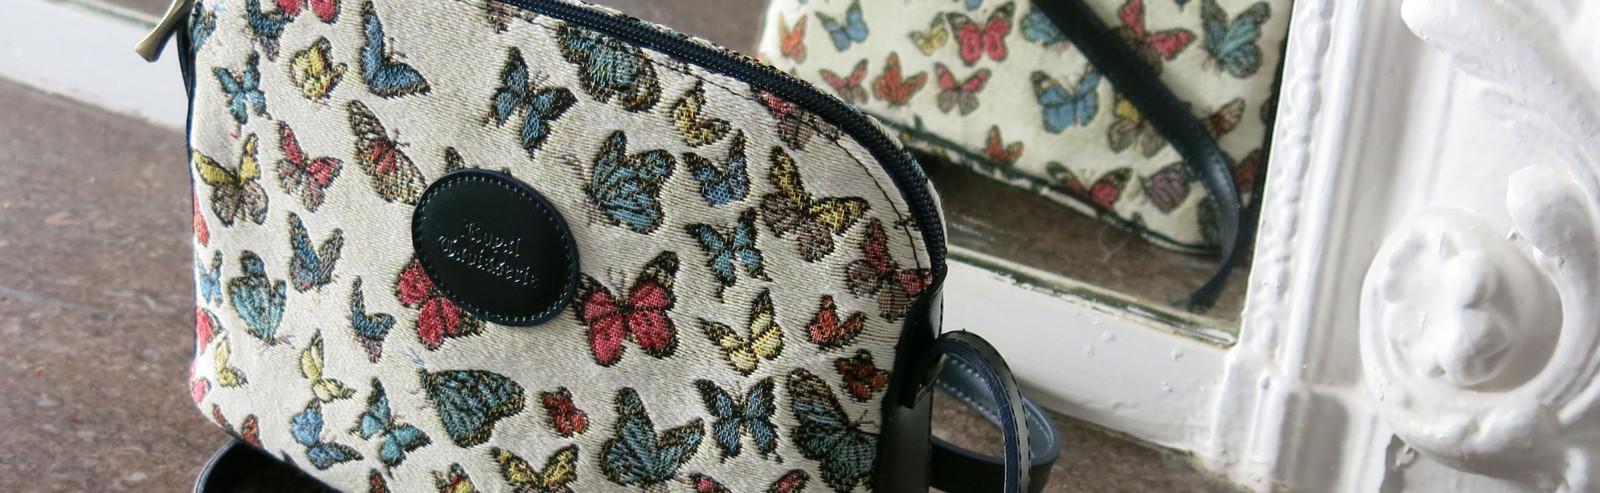 Royal Tapisserie made in France tapestry handbag french